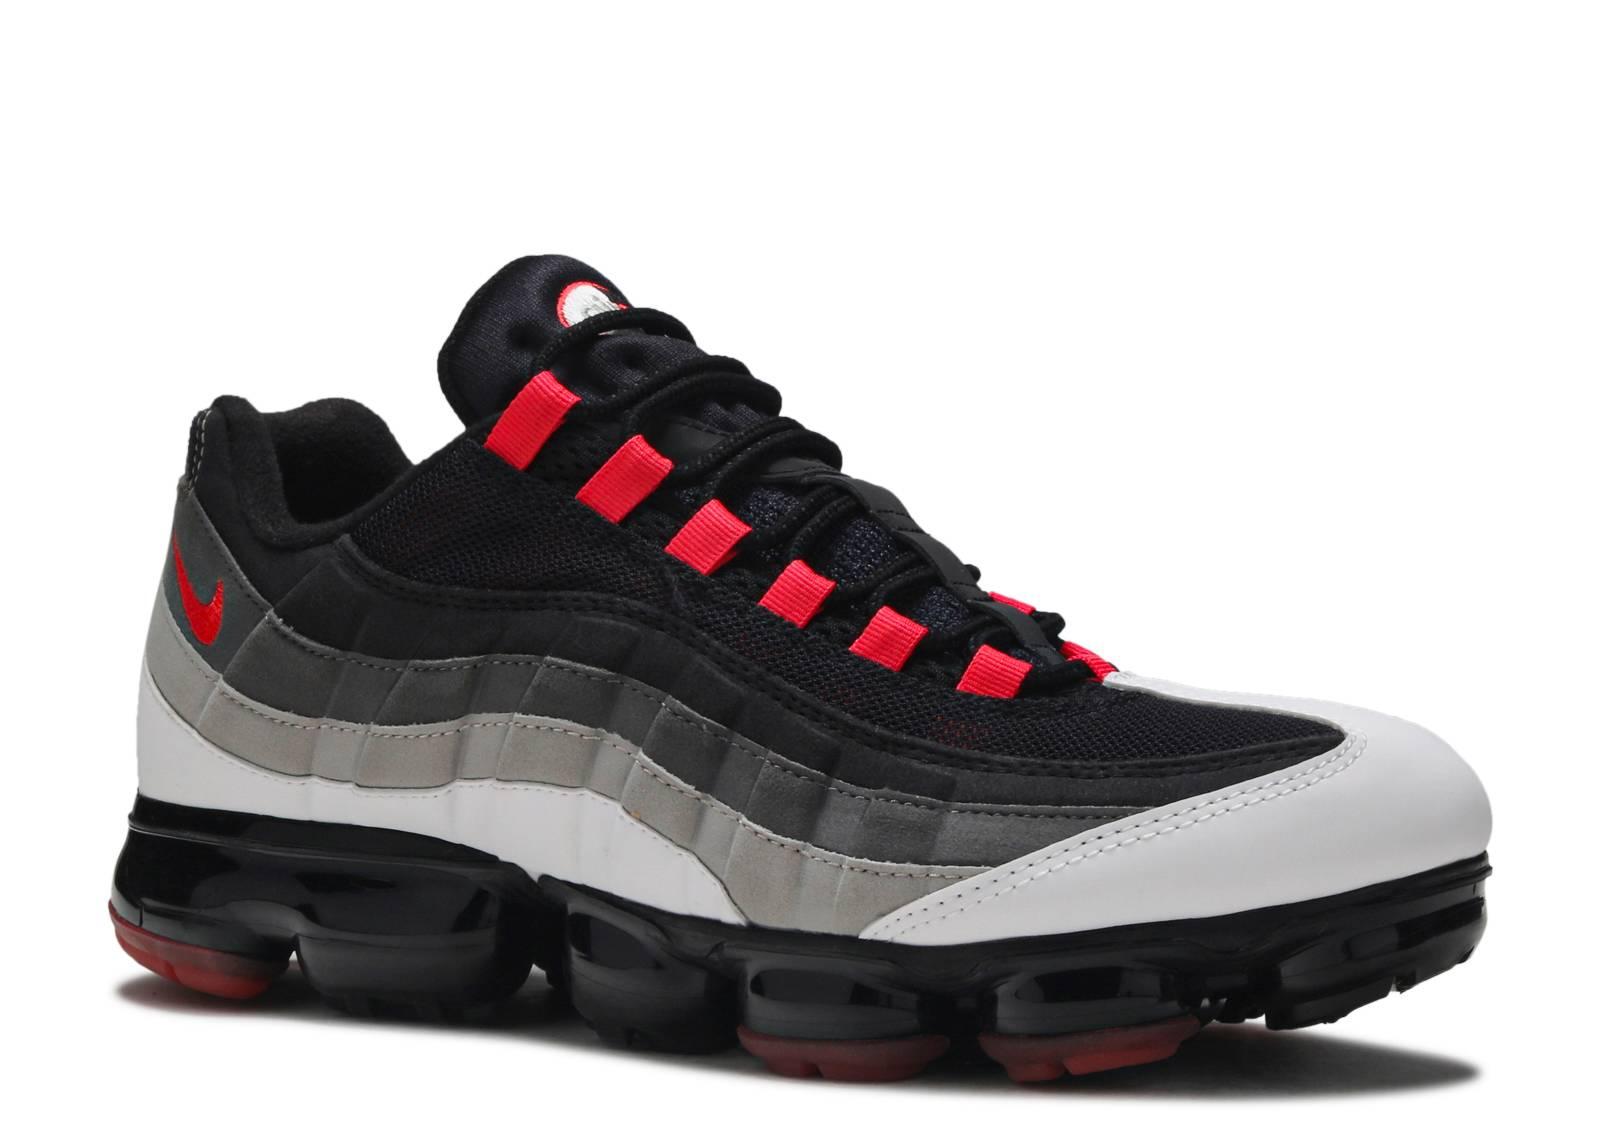 ddb8801a8db1 Air Vapormax  95 - Nike - aj7292 101 - white hot red-dk pewter